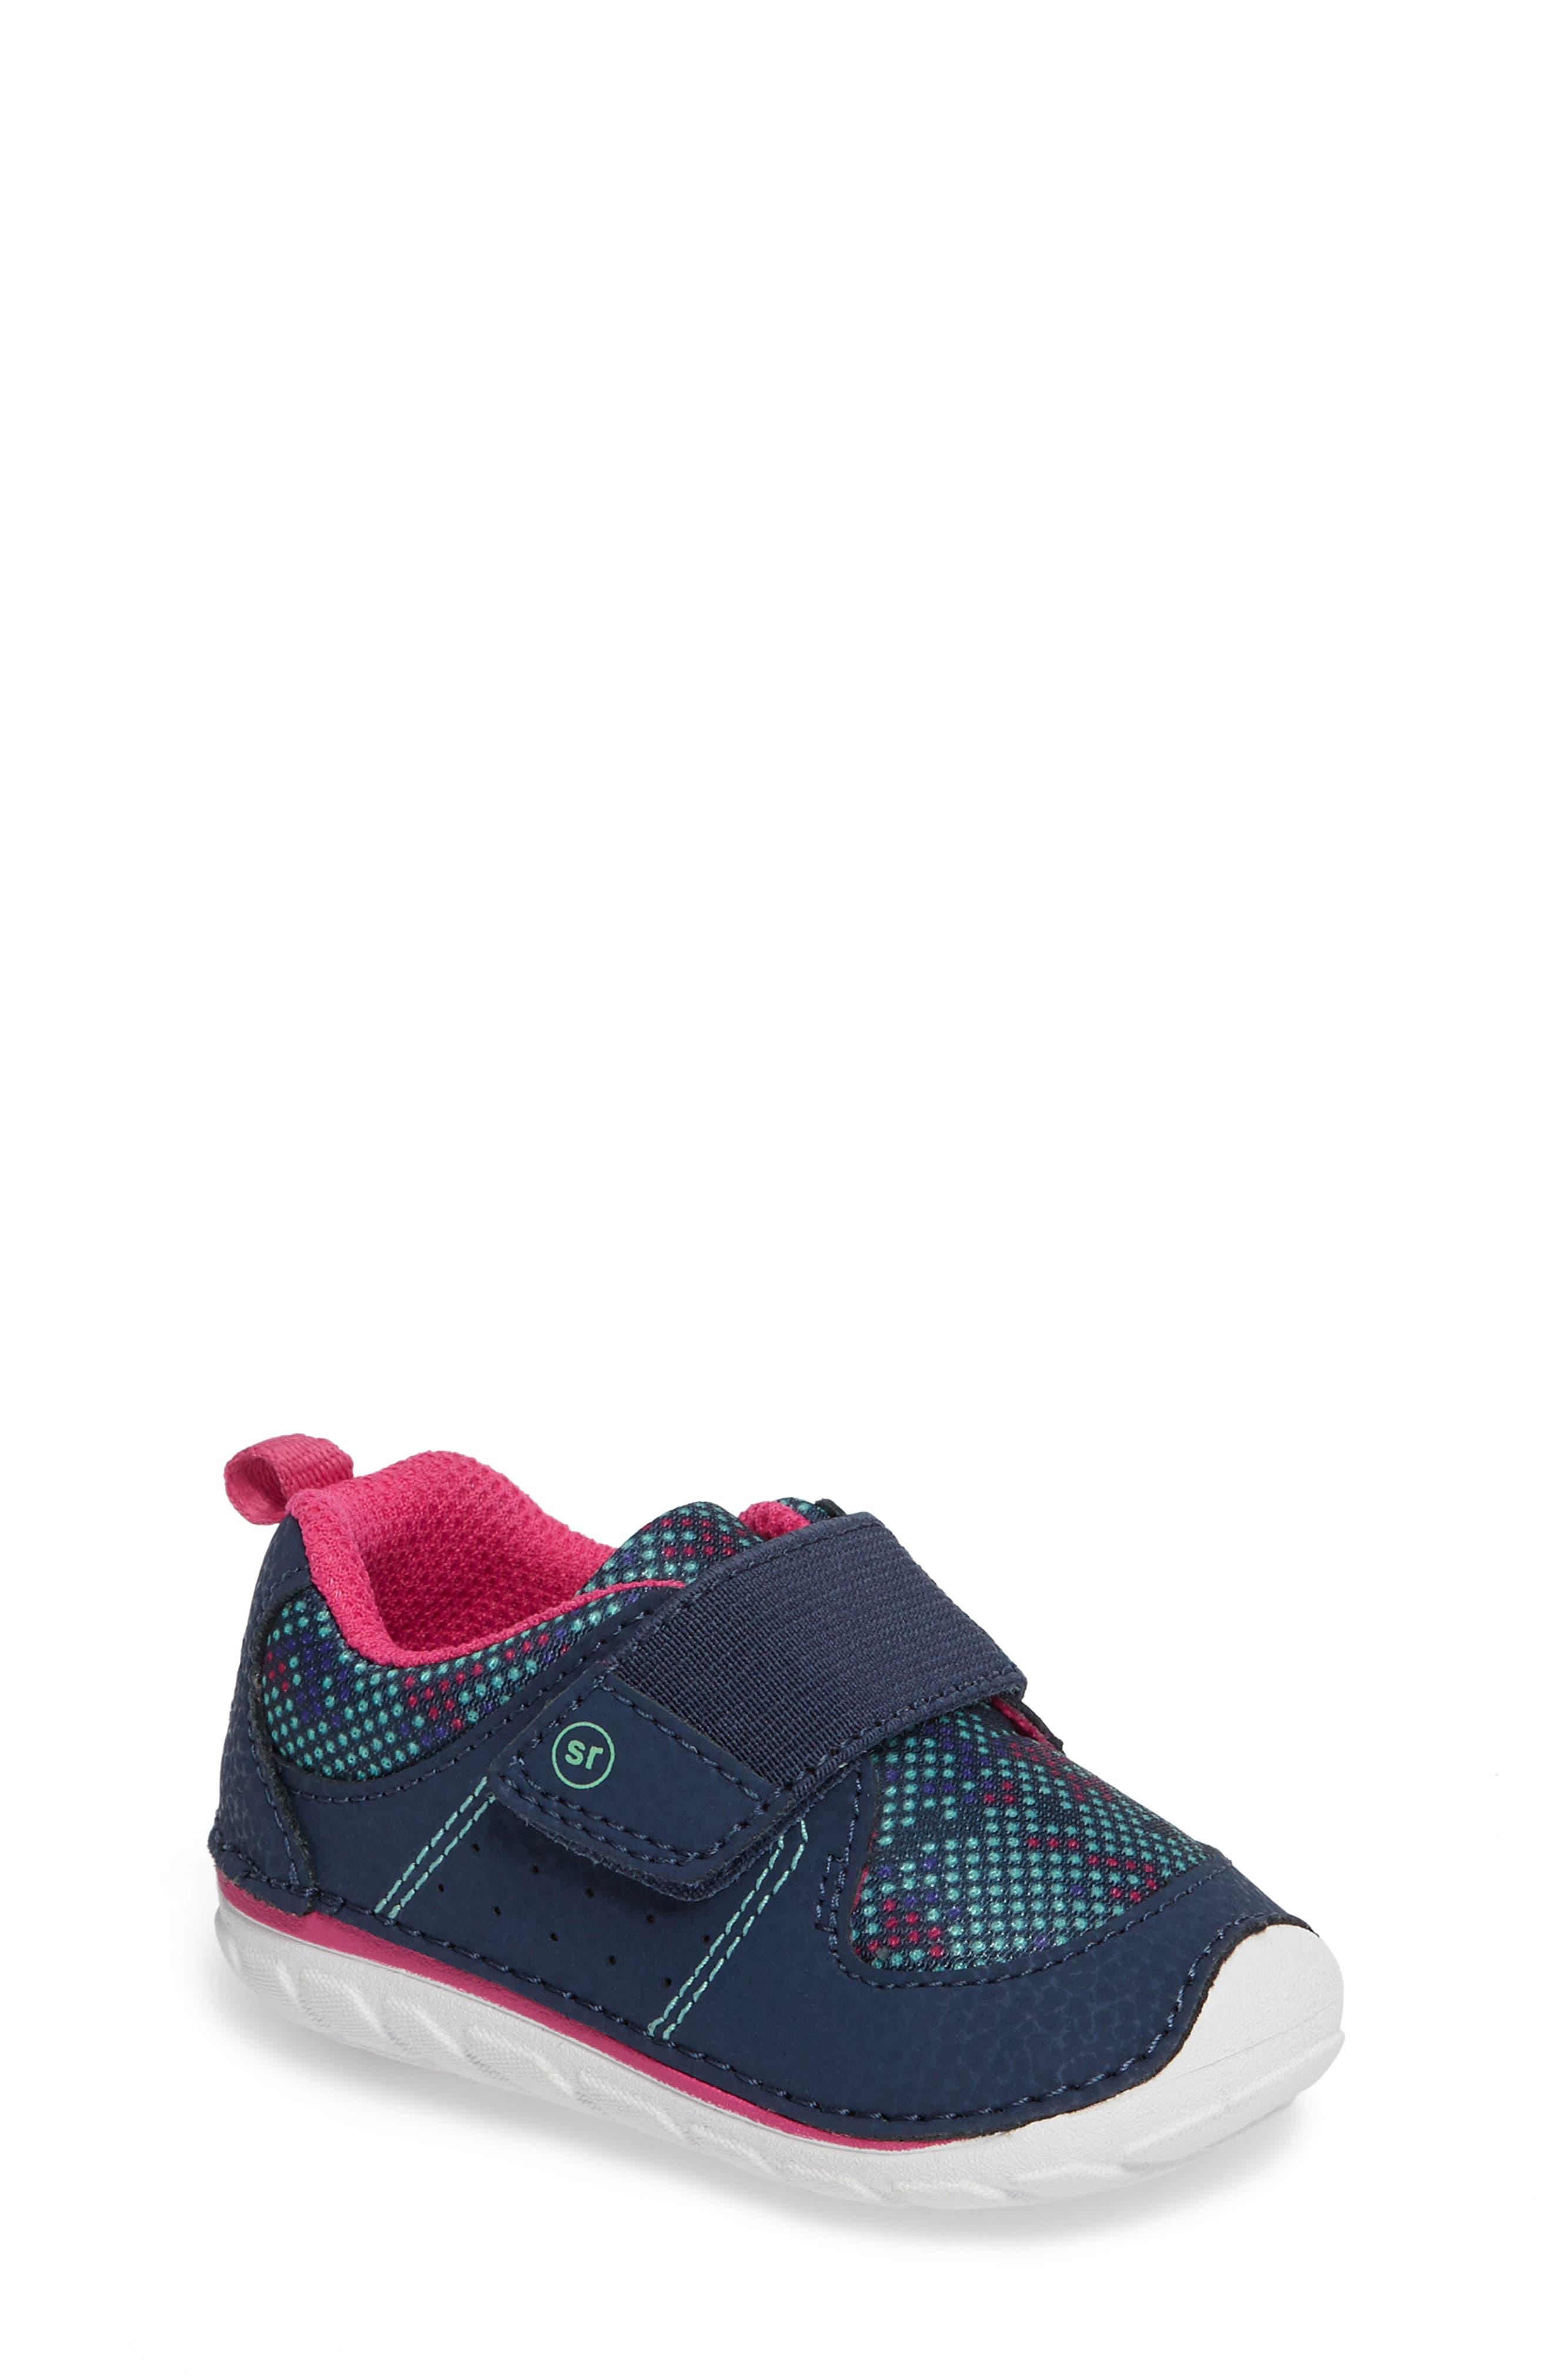 Soft Motion<sup>™</sup> Ripley Sneaker,                             Main thumbnail 1, color,                             Navy